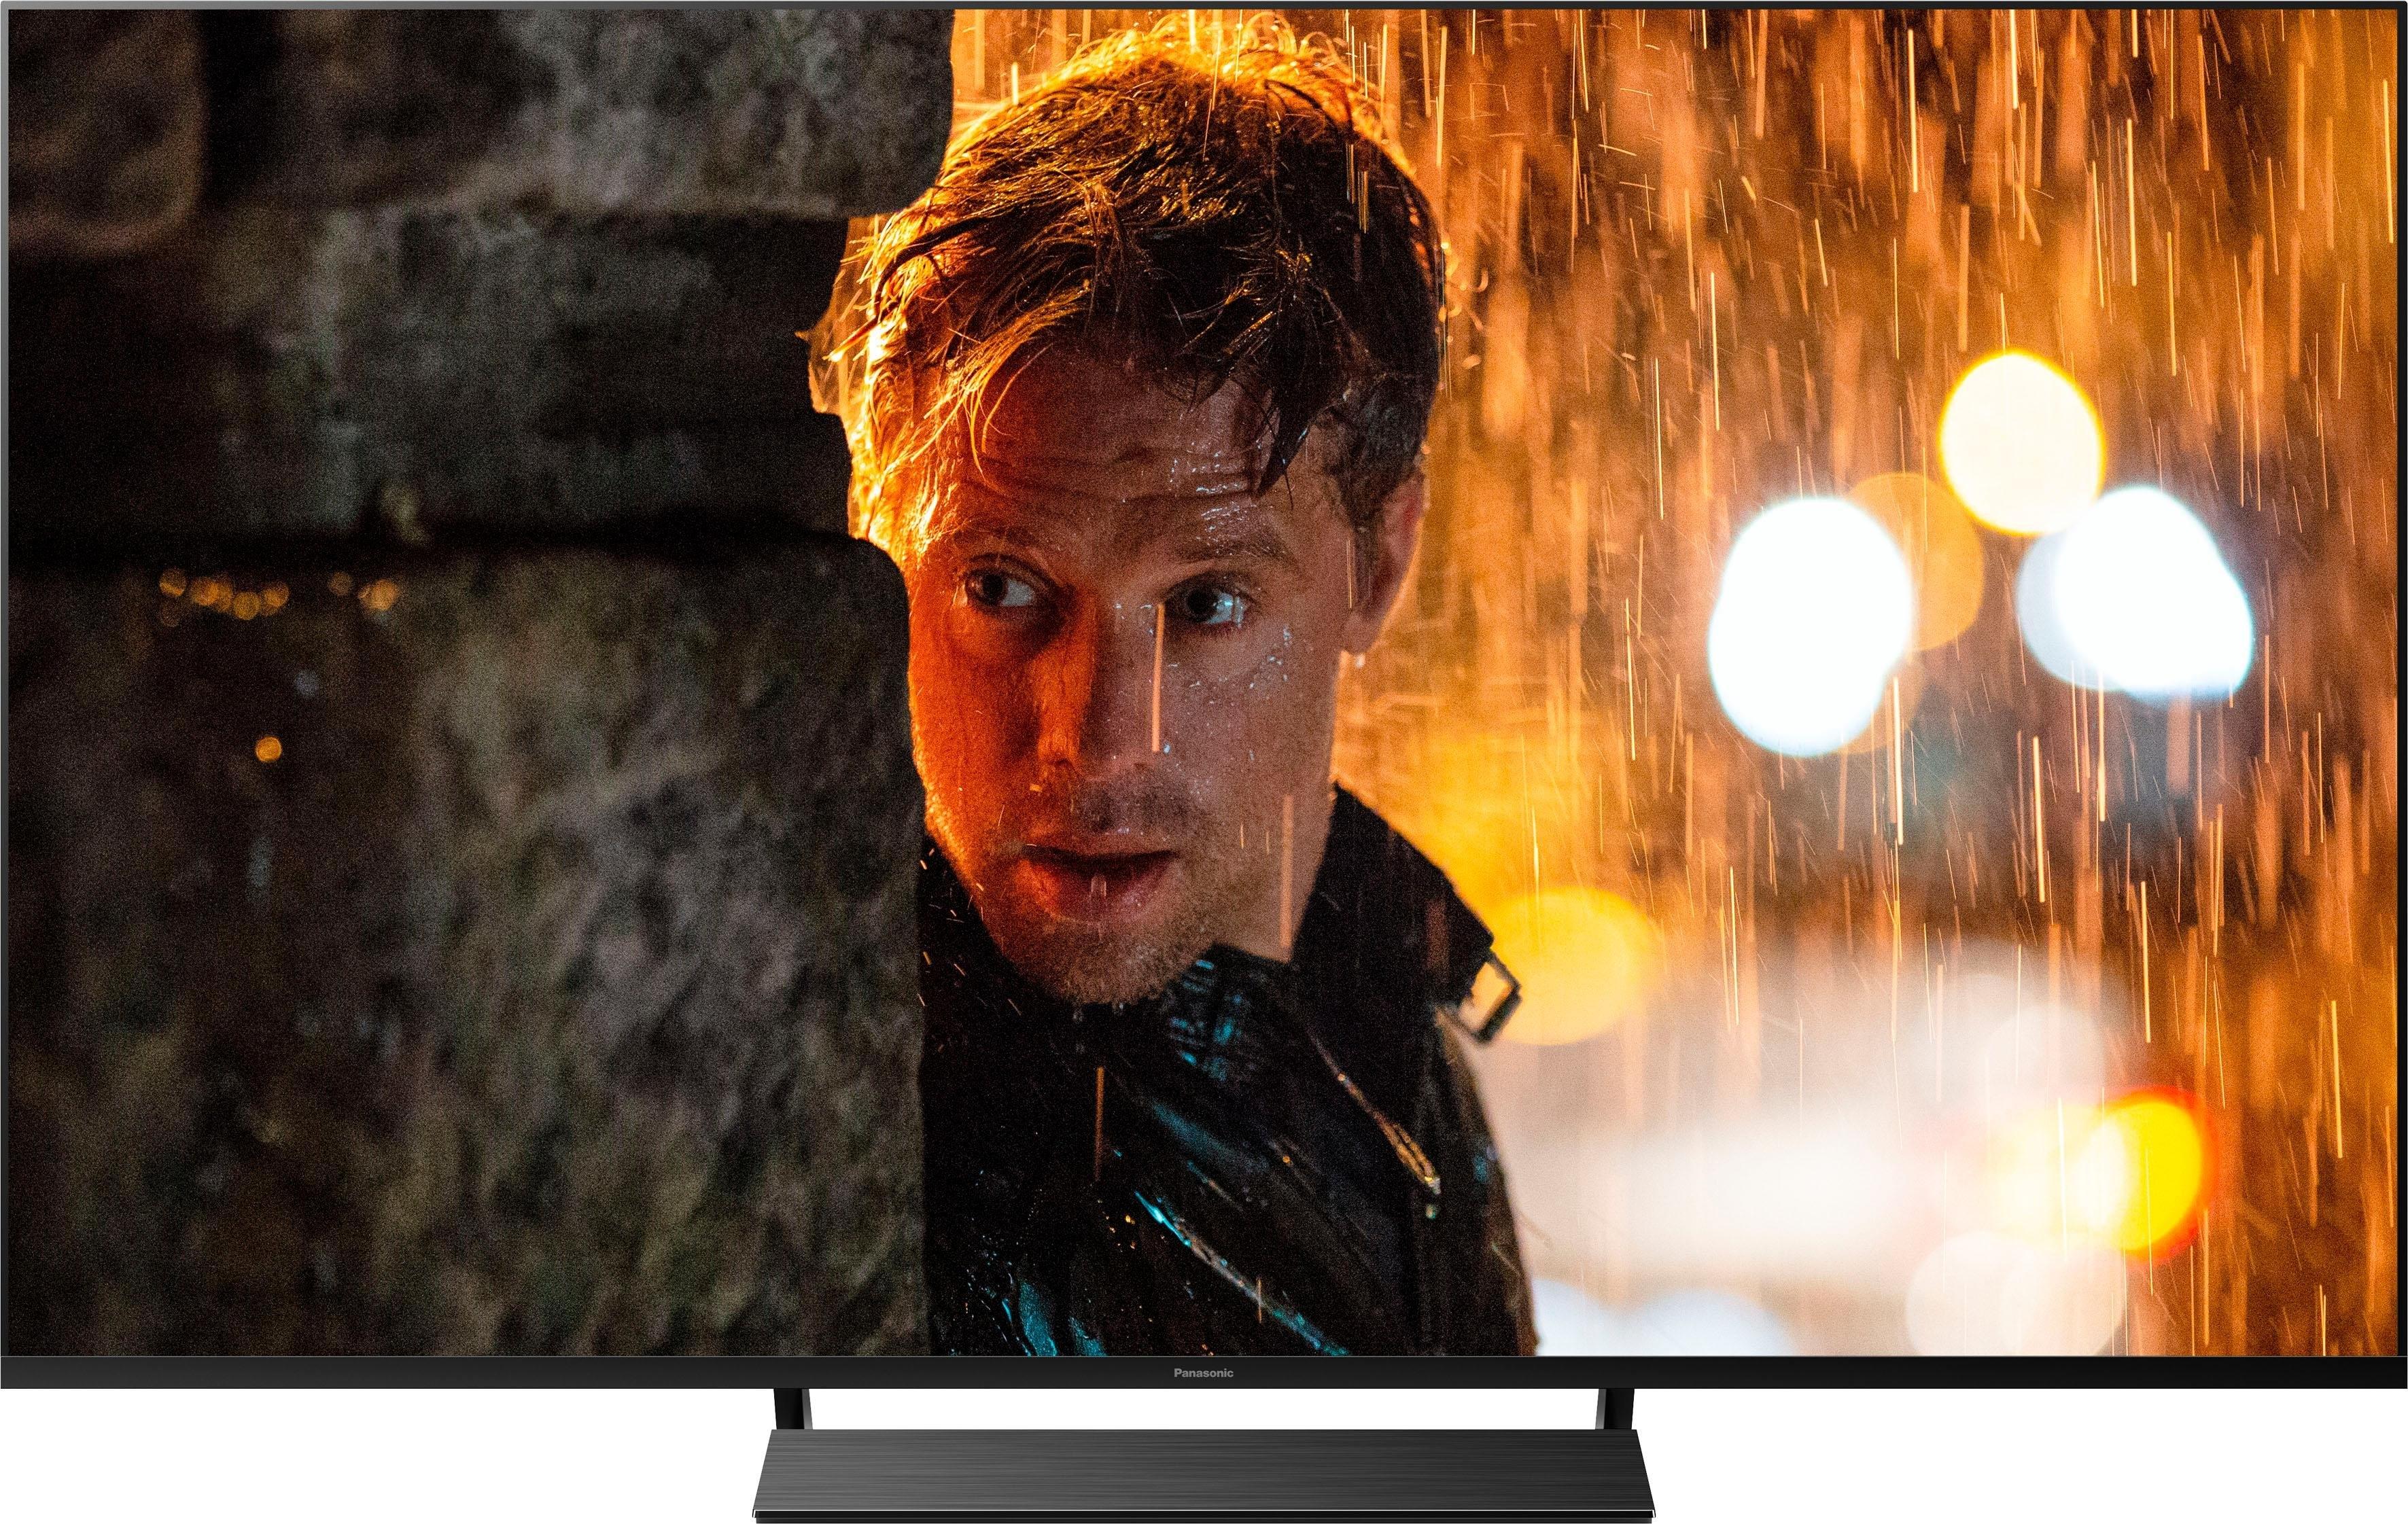 Panasonic TX-40GXW804 lcd-led-tv (100 cm / 40 inch), 4K Ultra HD, Smart-TV in de webshop van OTTO kopen